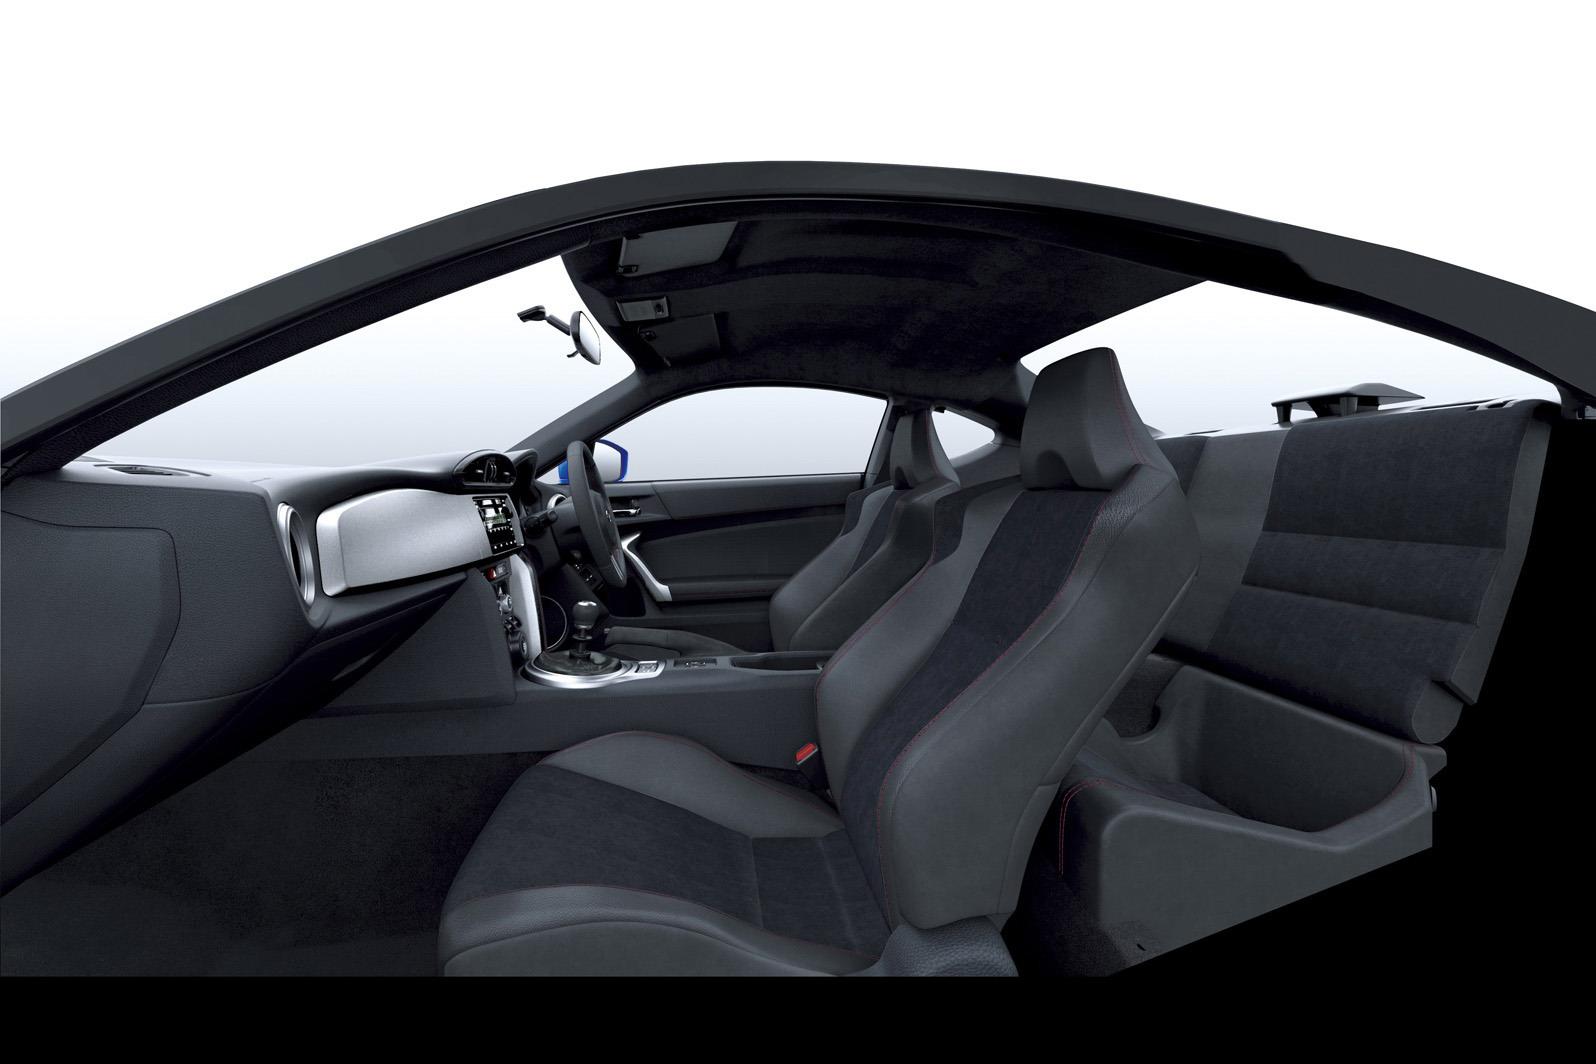 Subaru finally punches out the 2013 brz todd biancos 2013 subaru brz advertisements vanachro Images